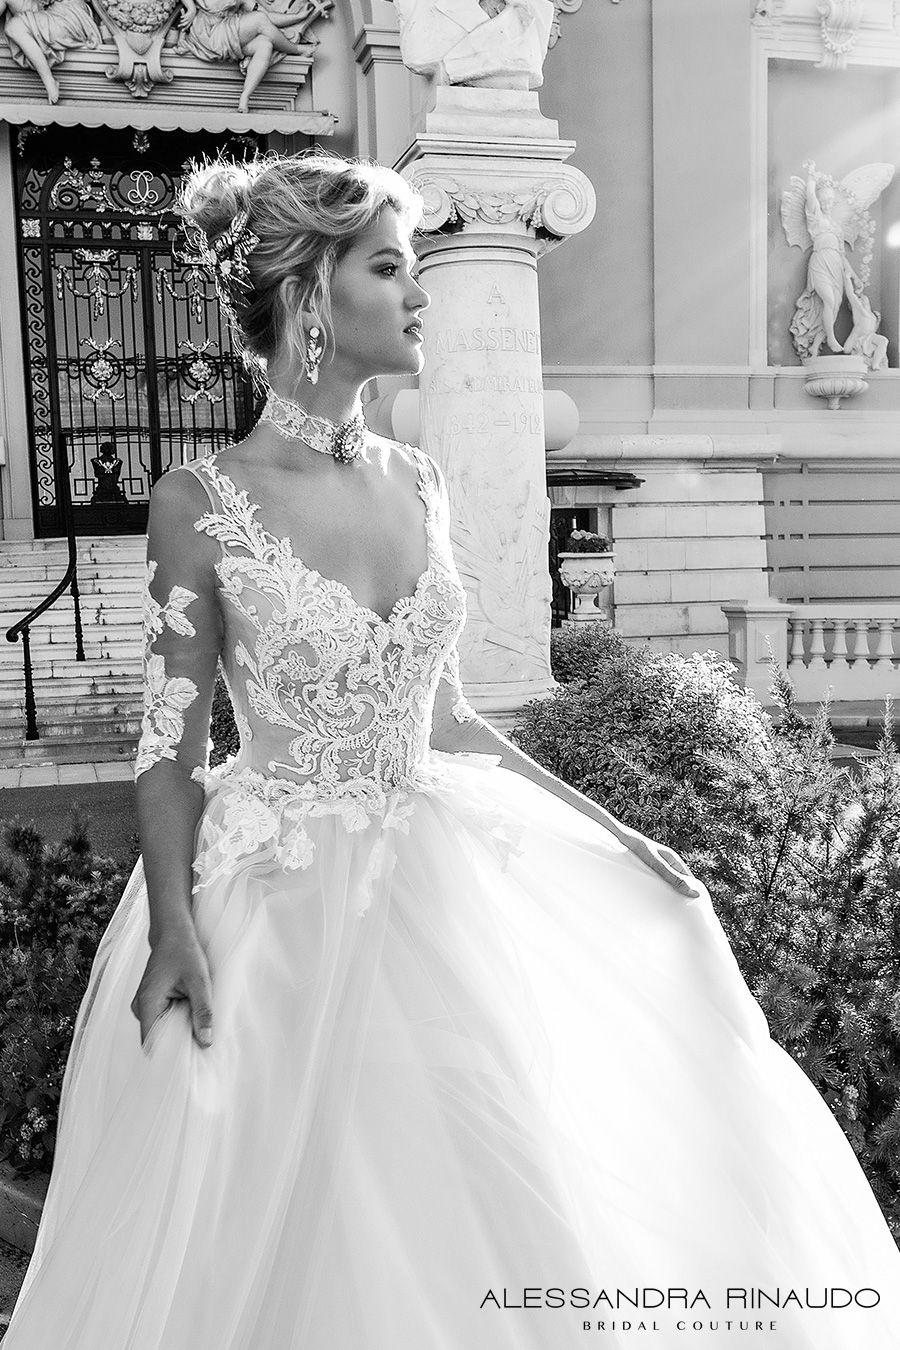 a842f6fabb4 alessandra rinaudo 2017 bridal half sleeves scoop neckline heavily  embellished bodice princess romantic a line wedding dress v back long royal  train ...